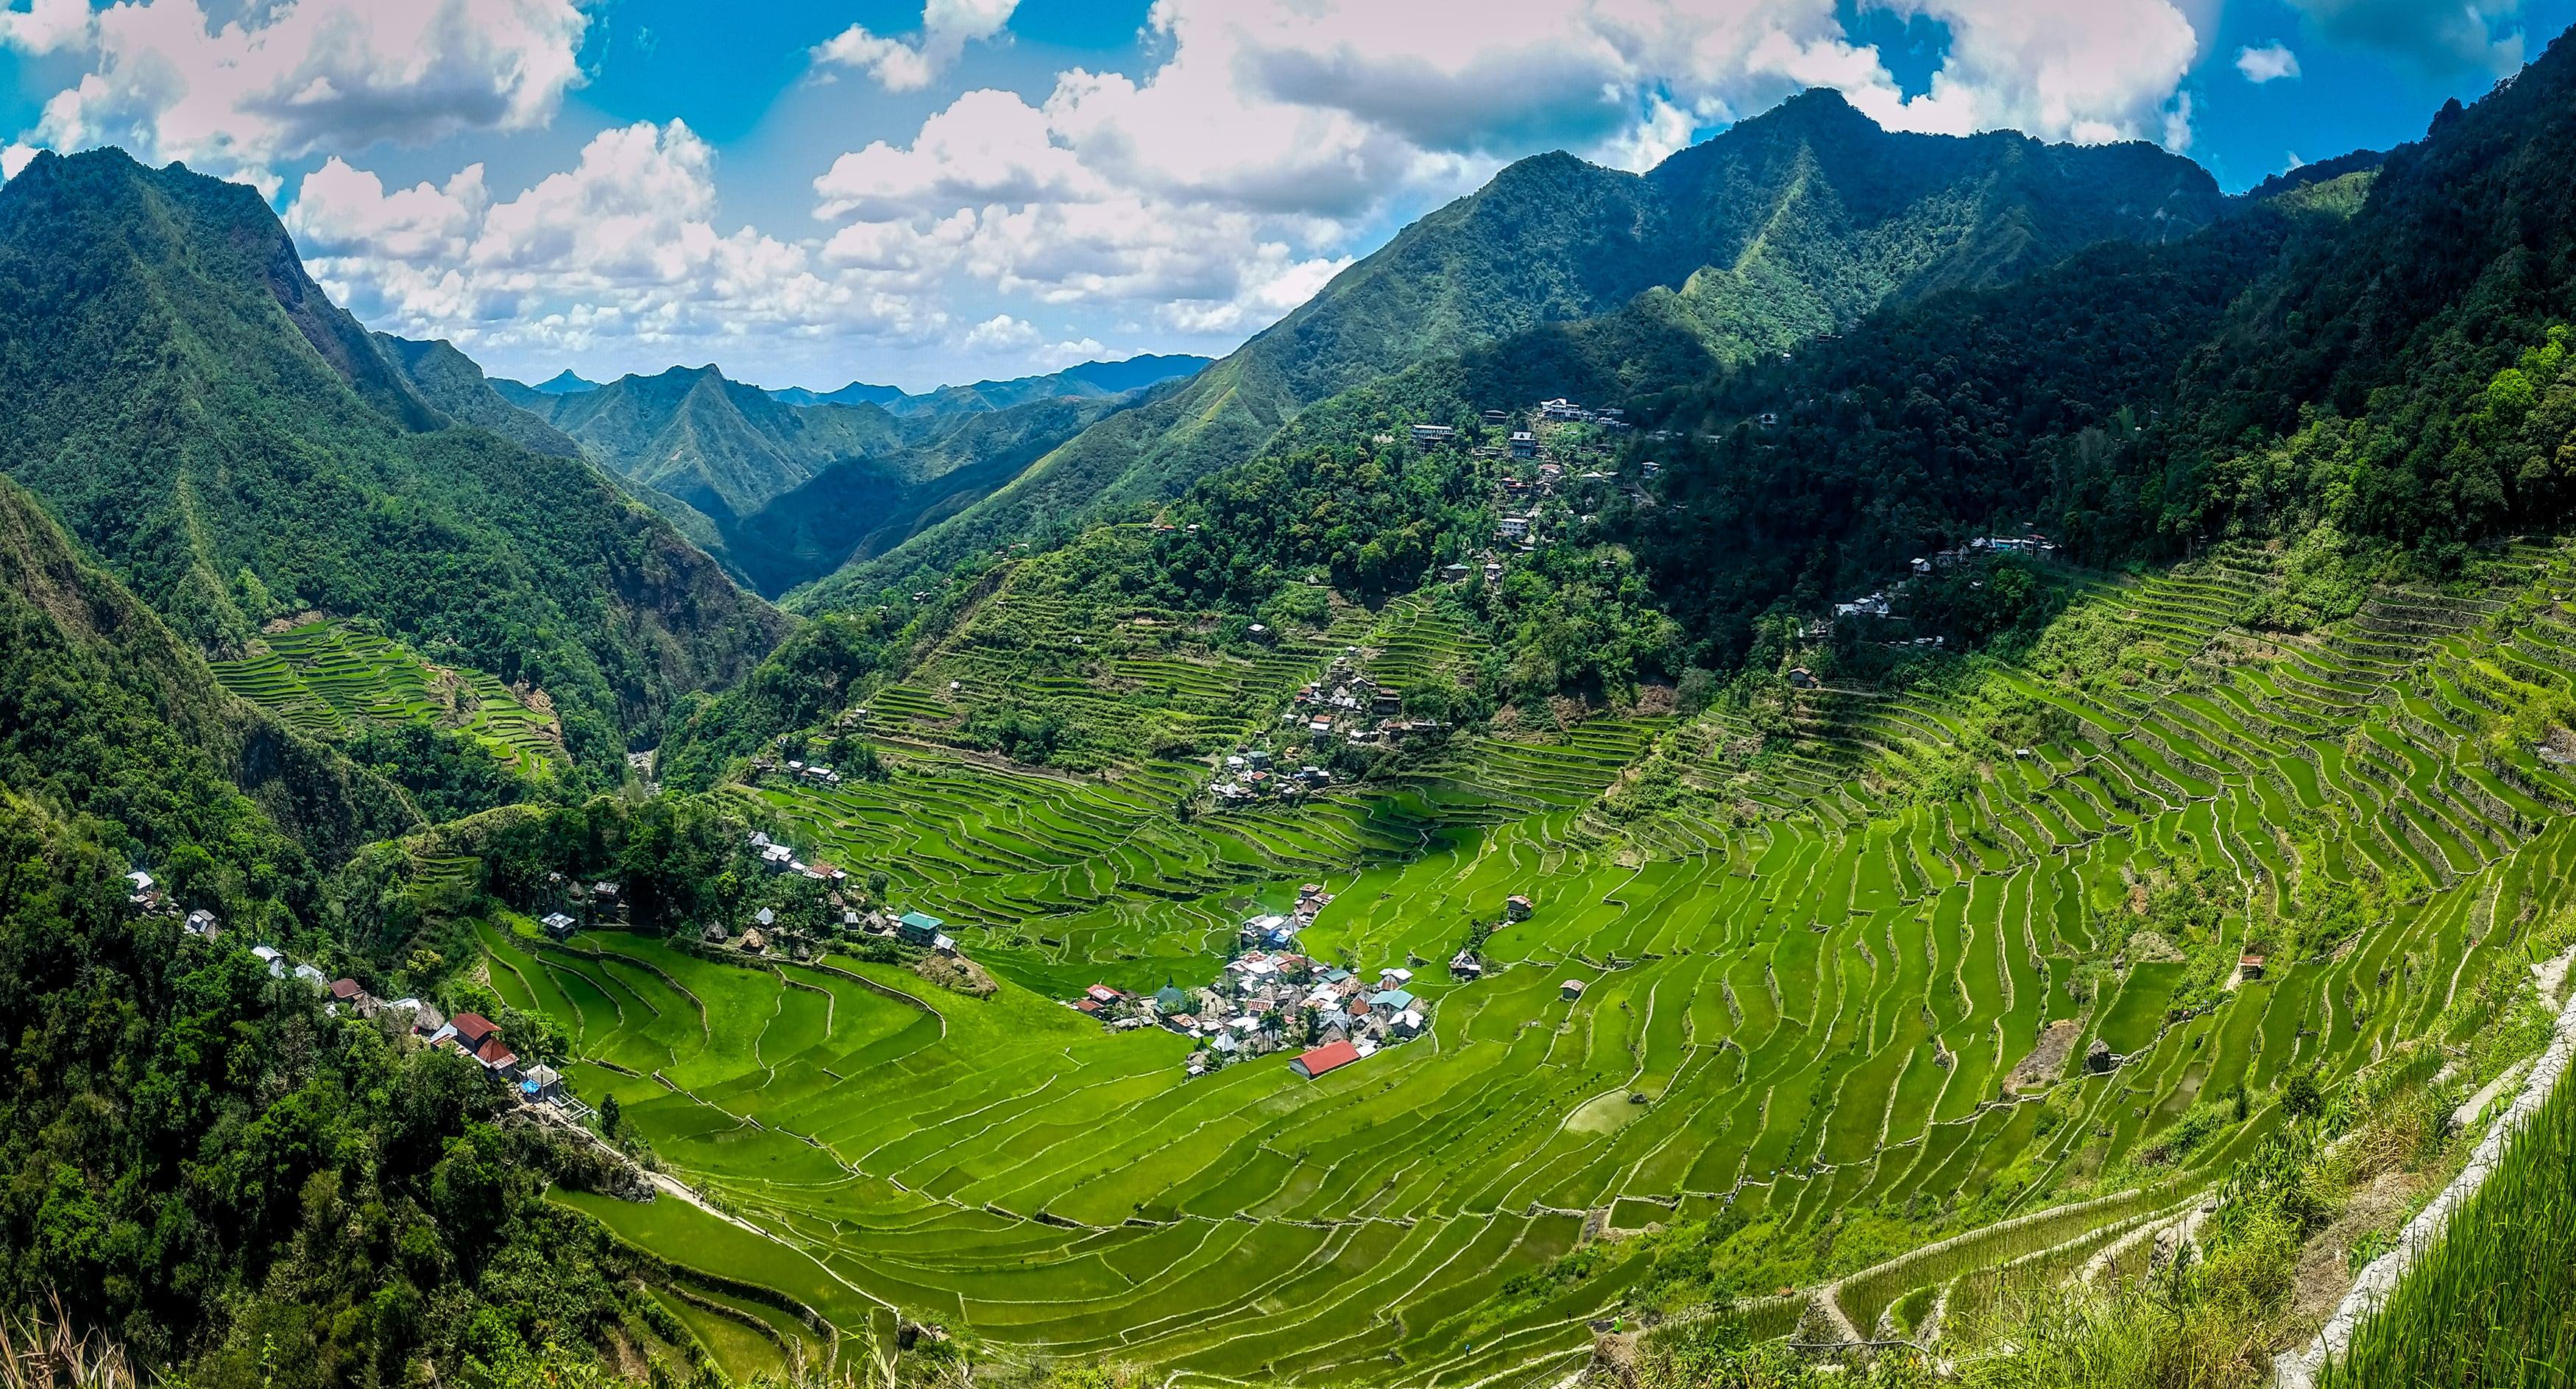 Breathtaking scenery of Batad Rice Terraces